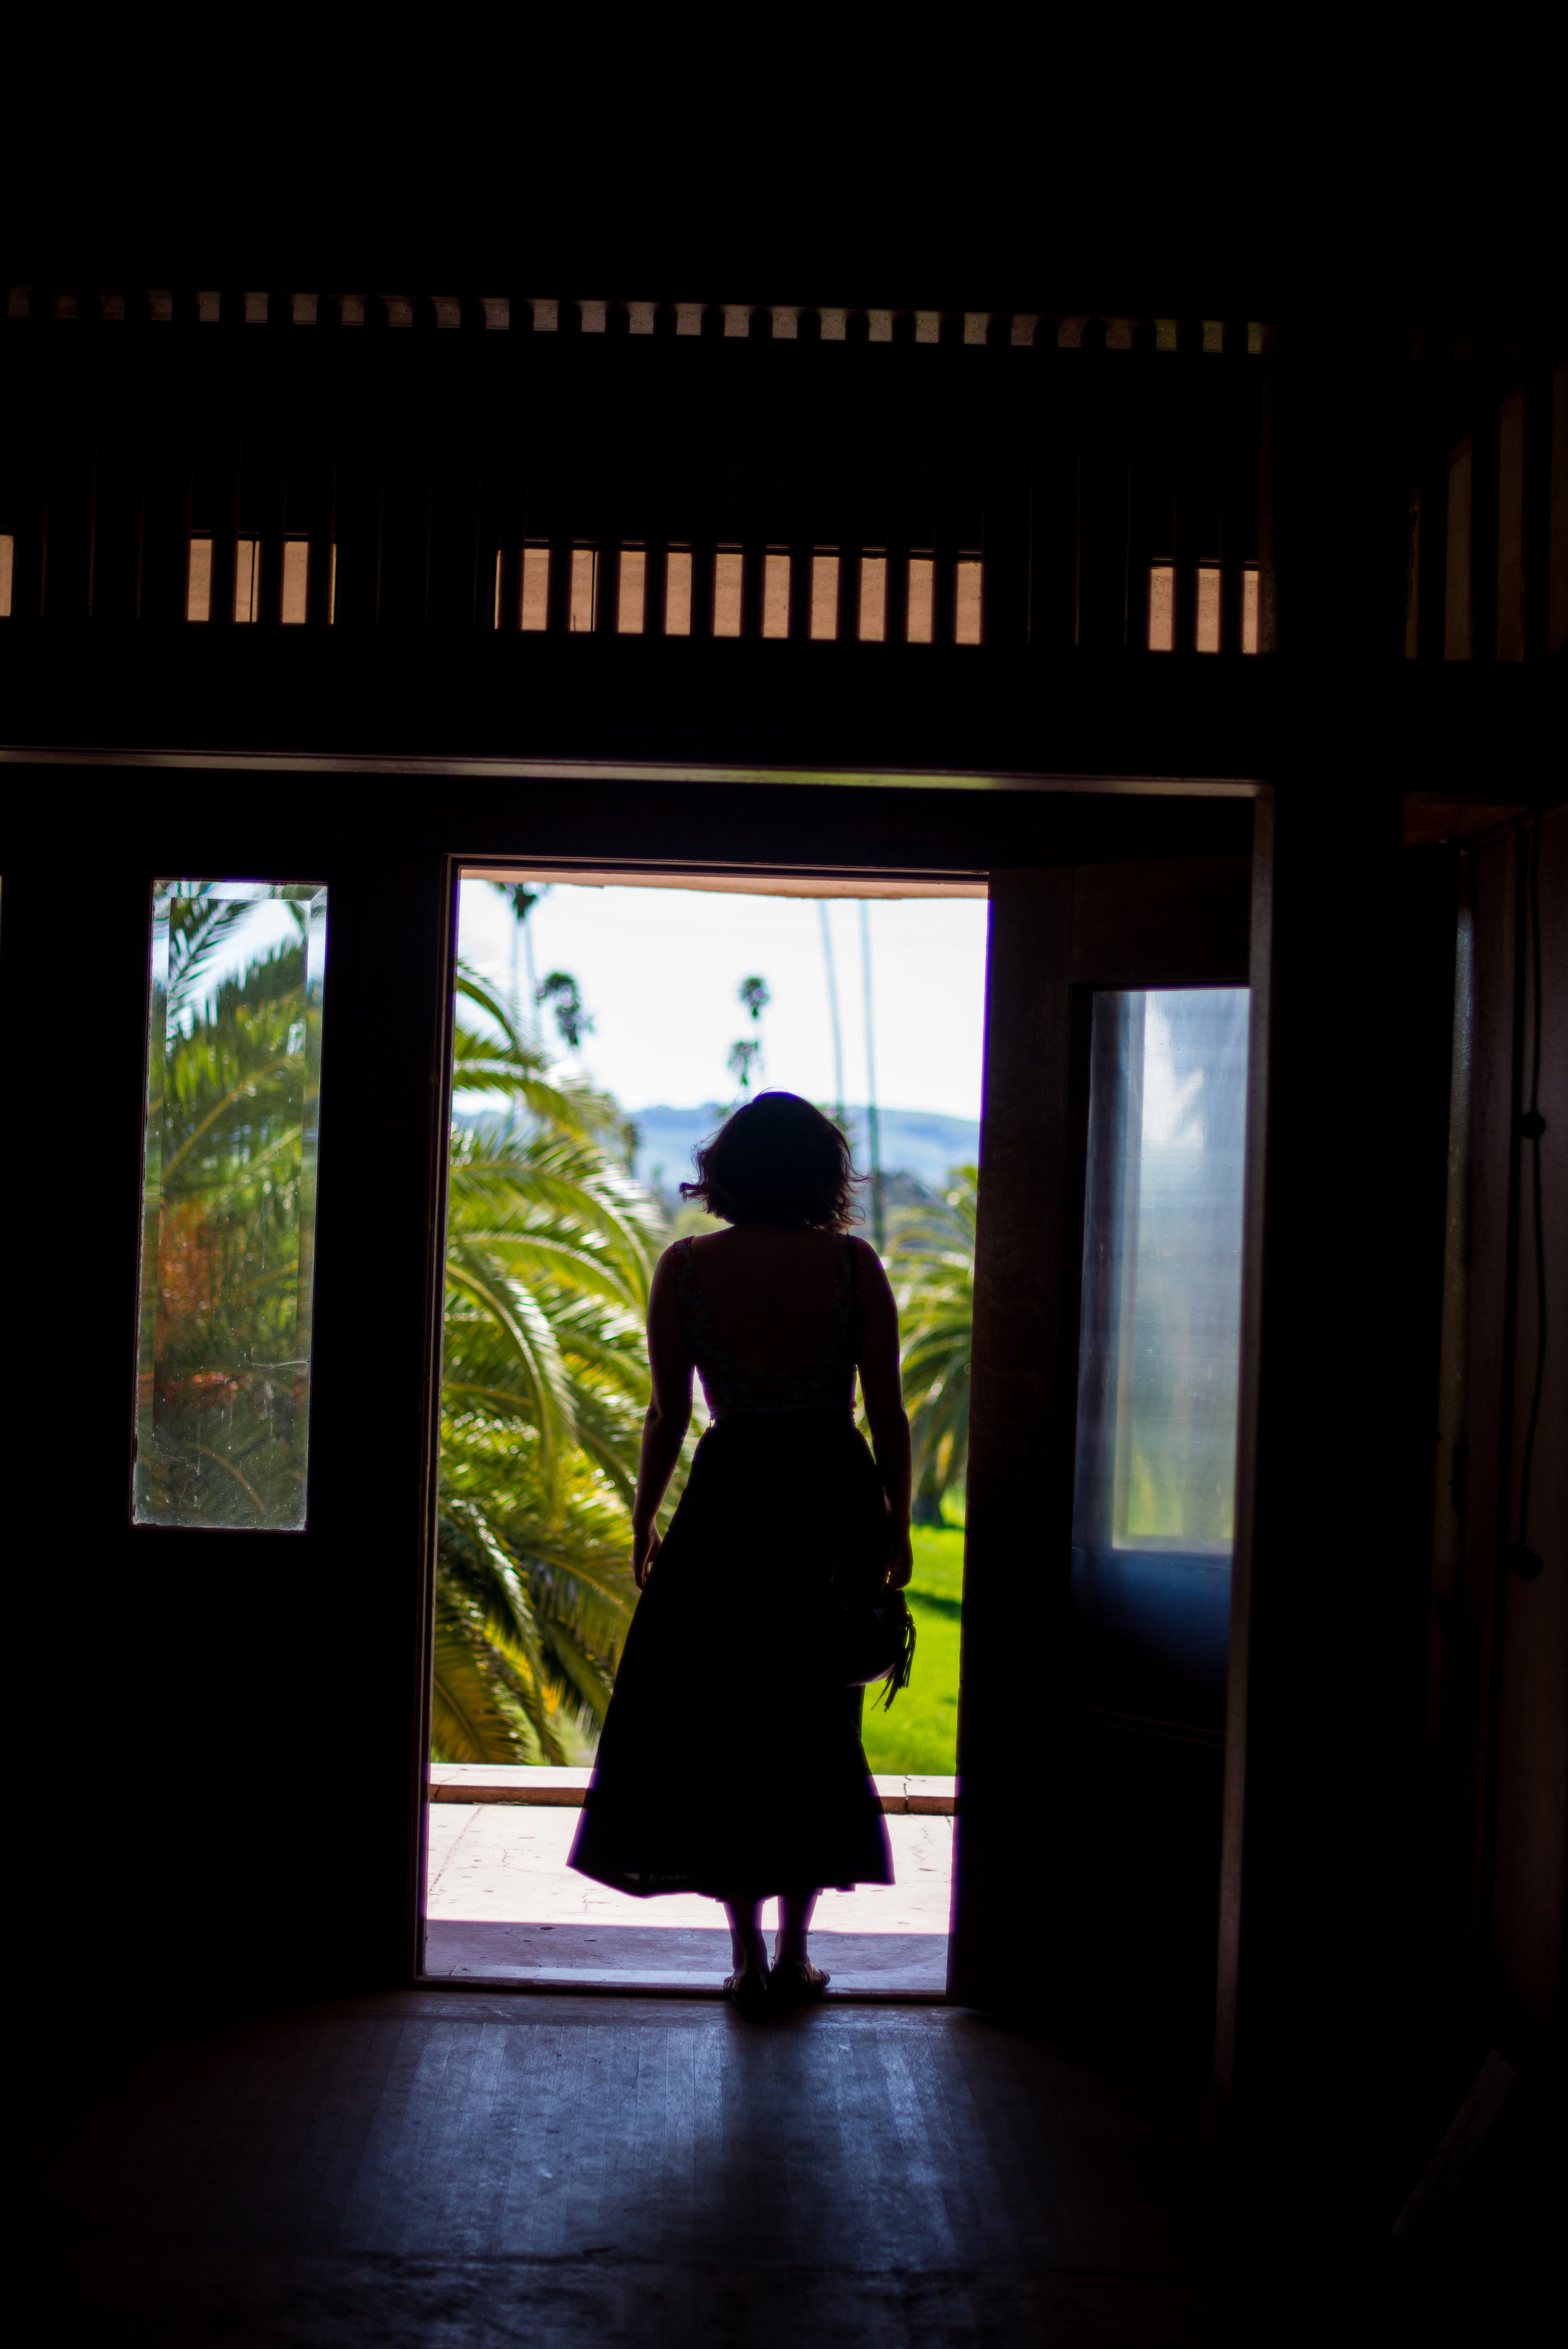 a-silhouette_13208145374_o.jpg